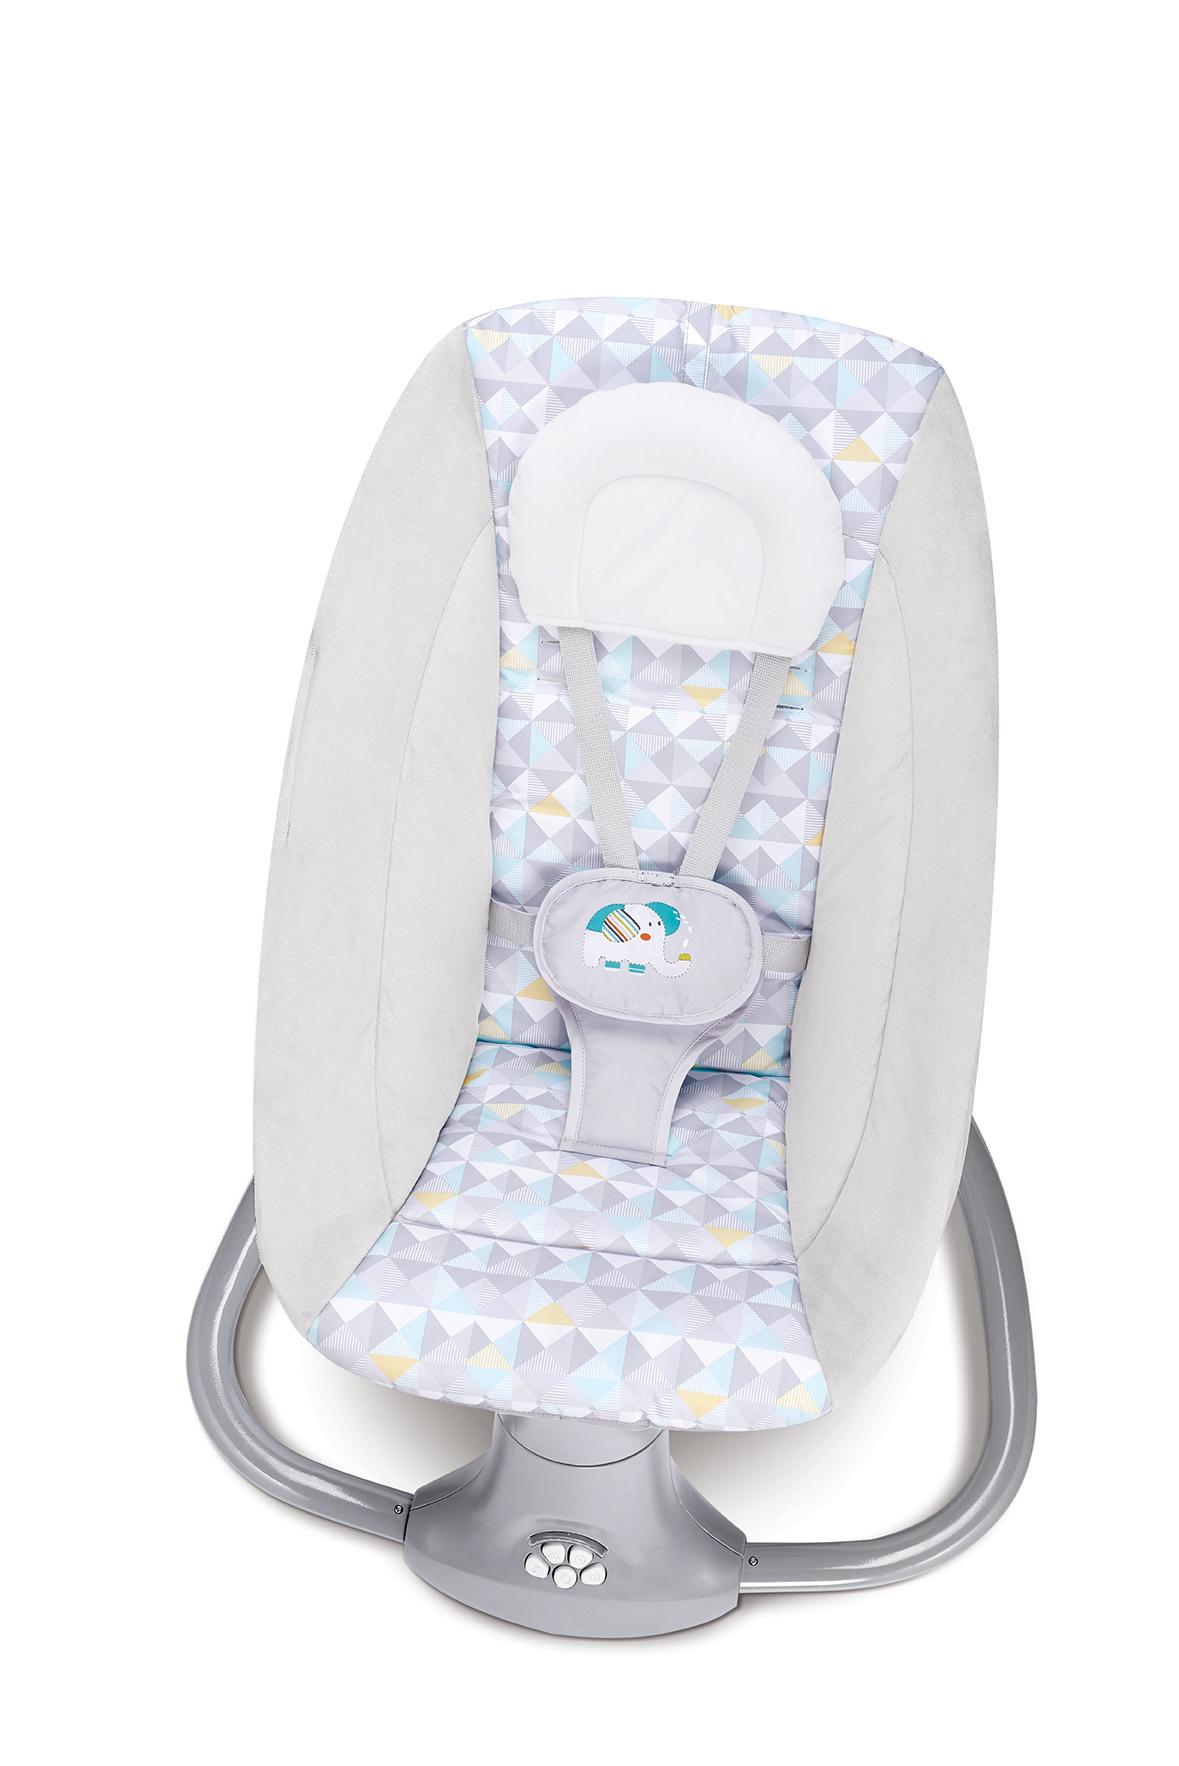 Mothercare | Mastela 3 In1 Swing 8102 Lt.Grey